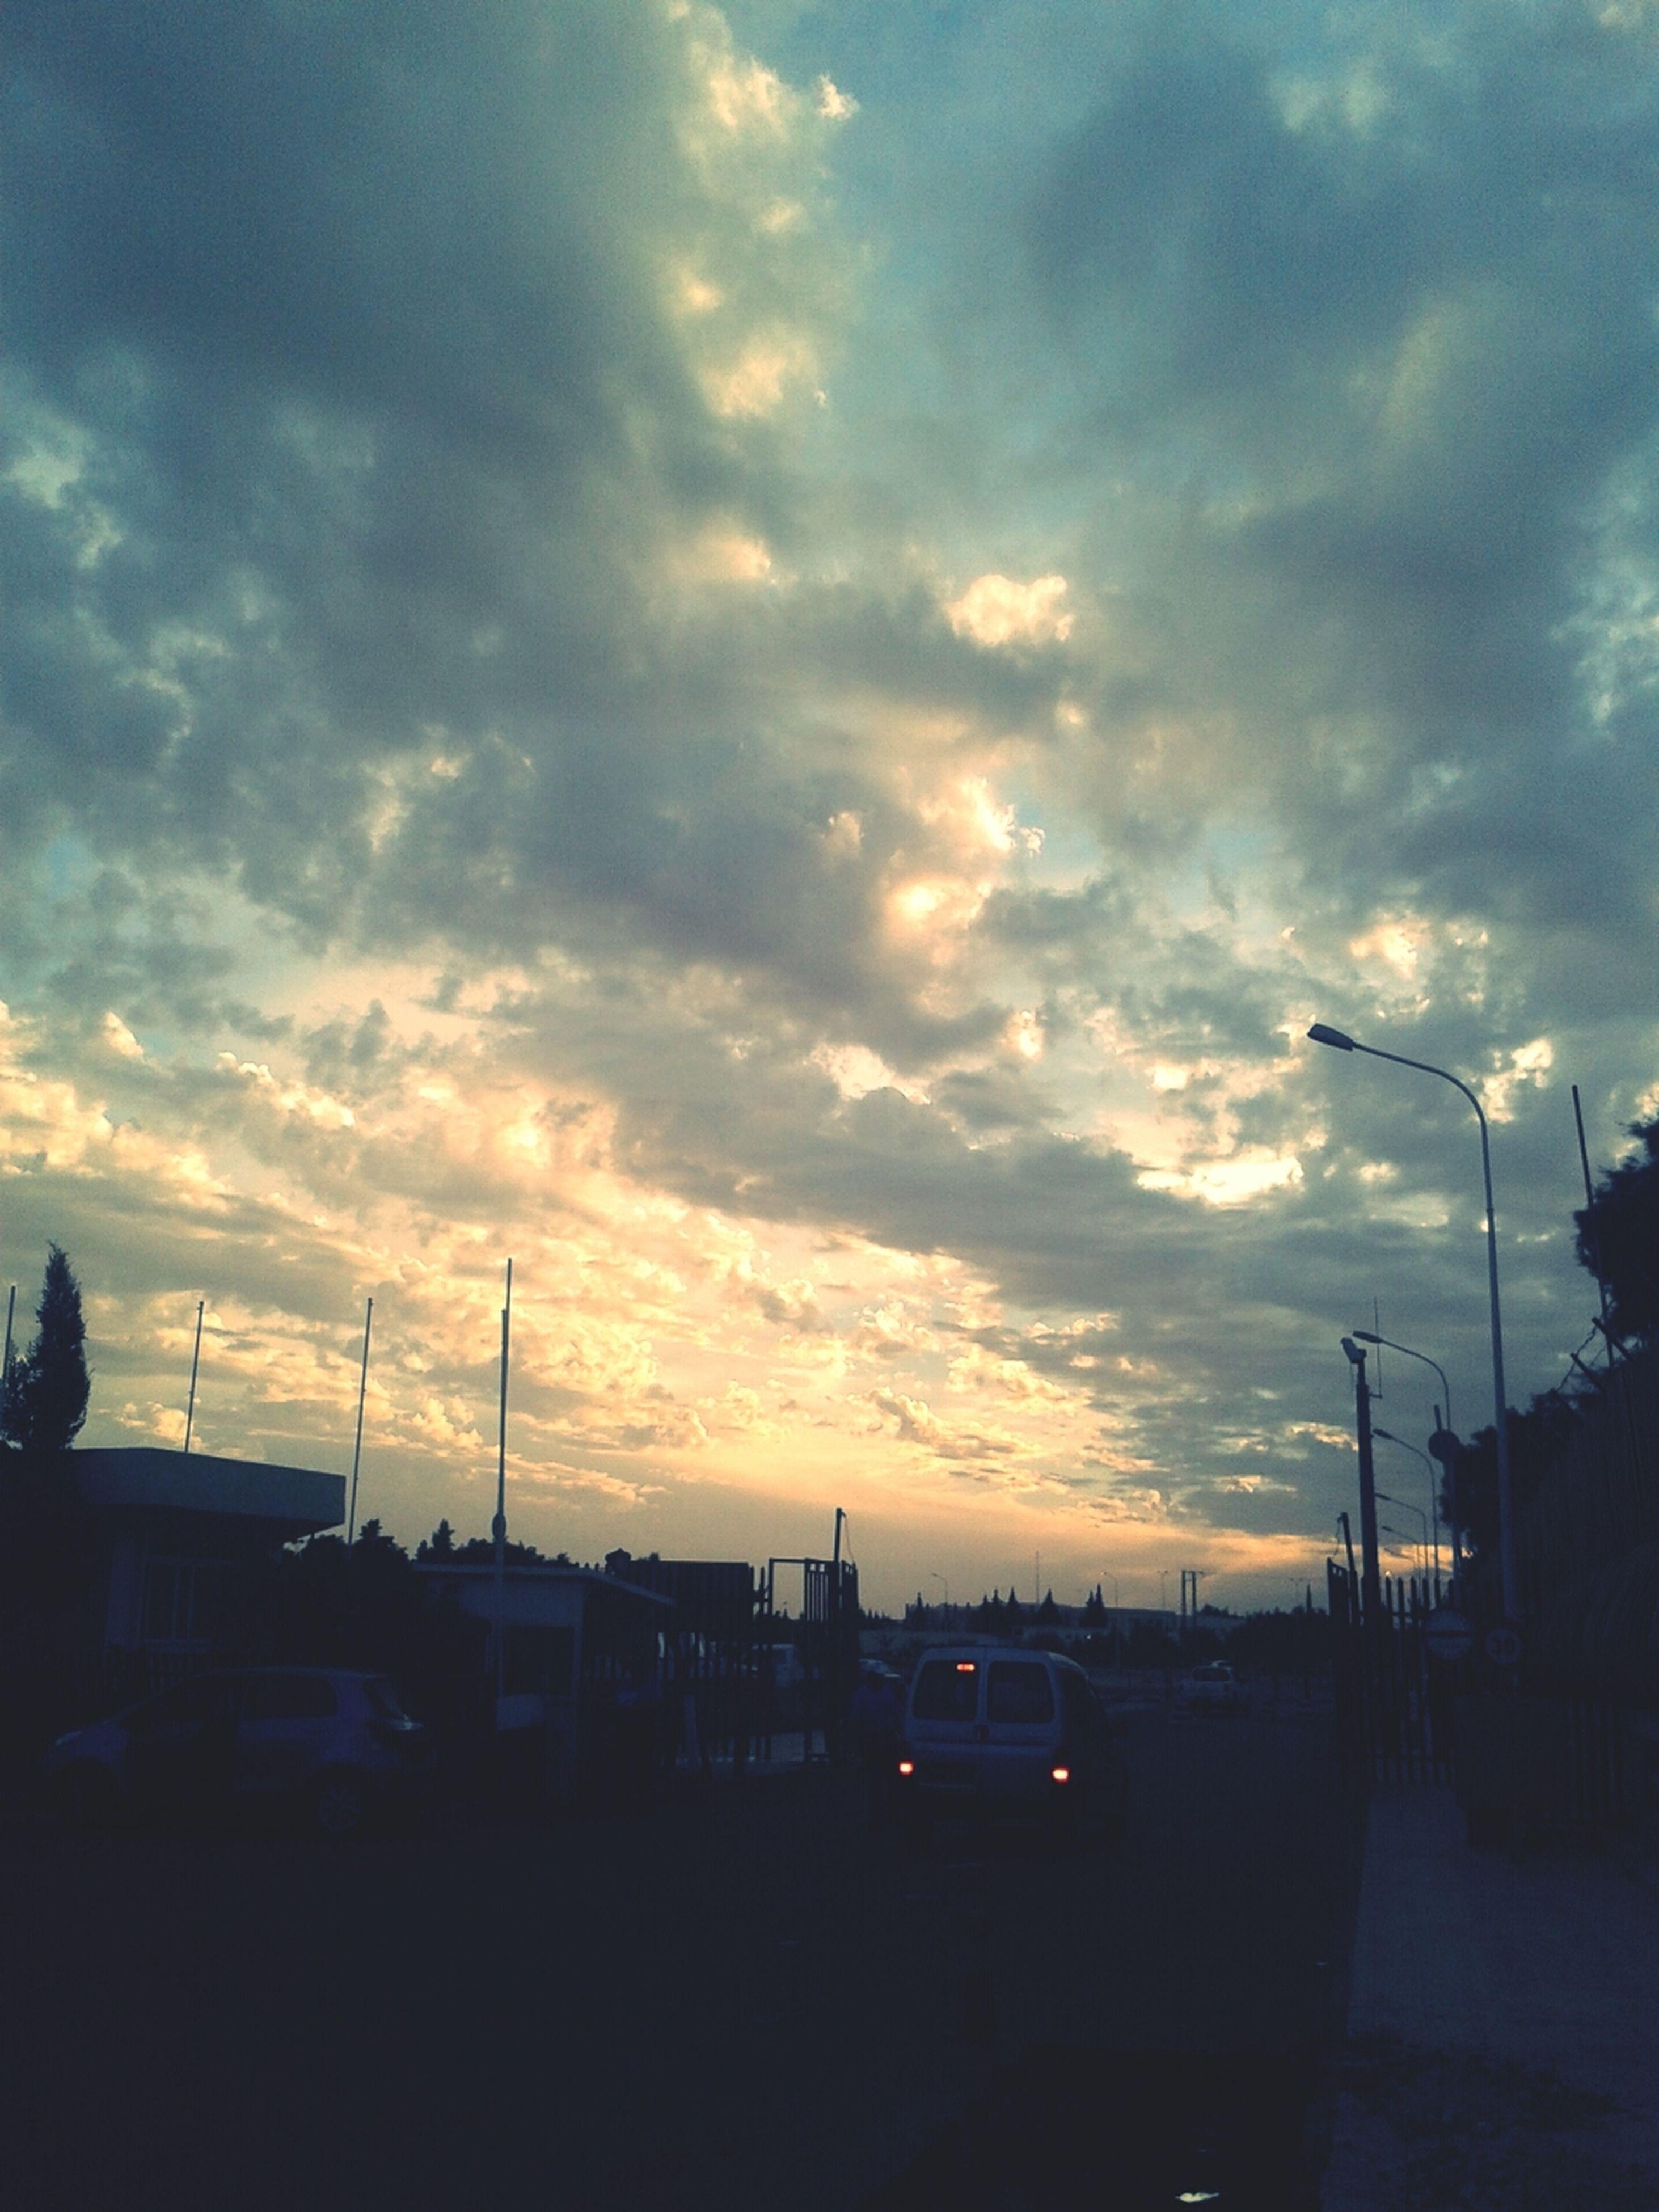 sky, transportation, sunset, car, cloud - sky, silhouette, mode of transport, land vehicle, cloudy, street light, road, street, cloud, dusk, building exterior, built structure, outdoors, nature, parking lot, city